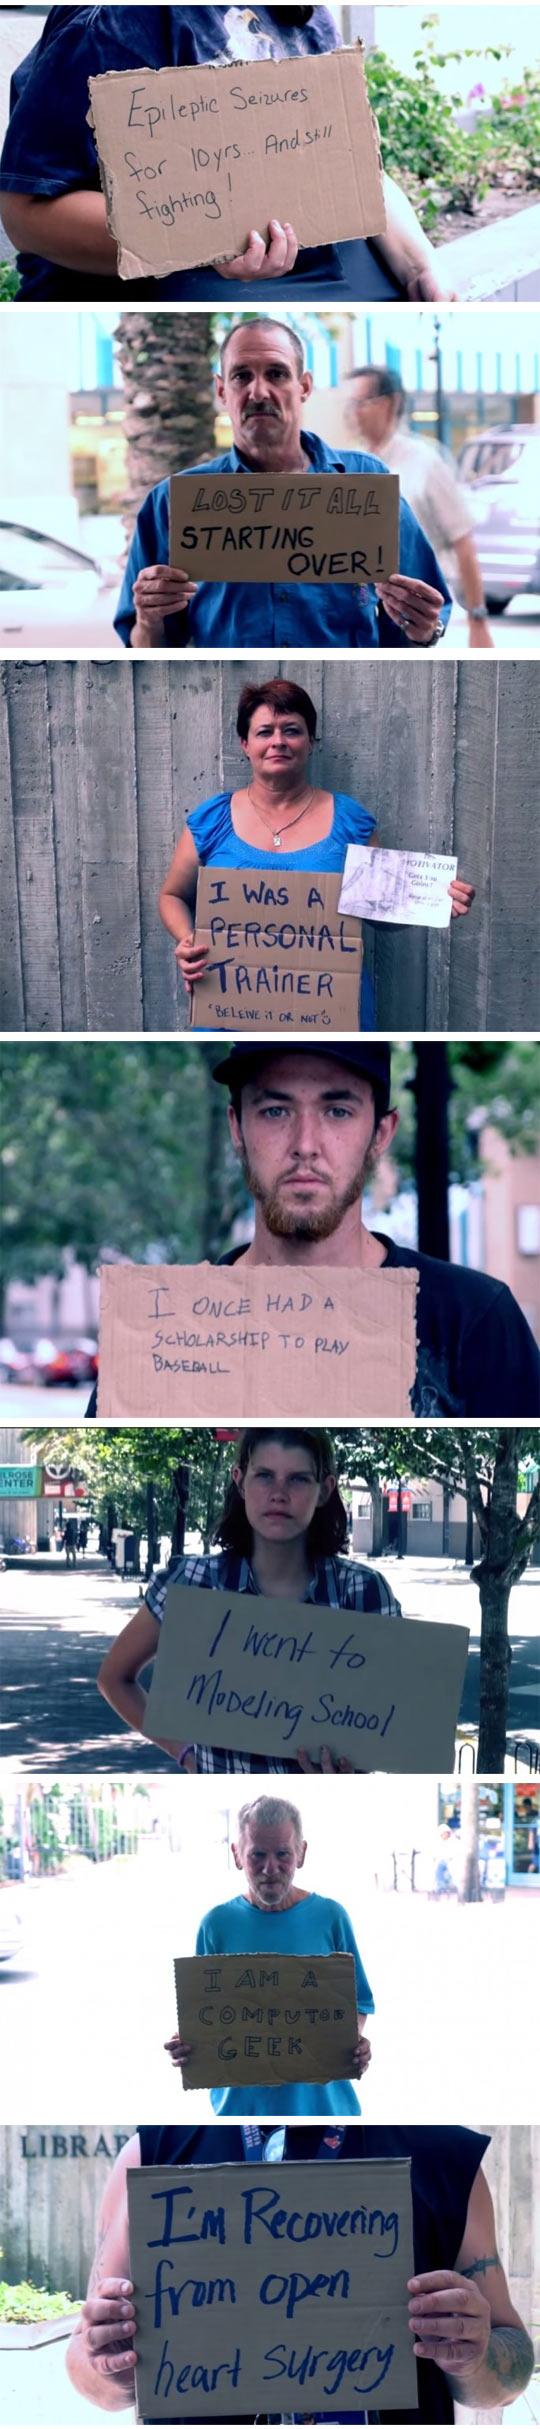 funny-homeless-cardboard-stories-street-scholarship